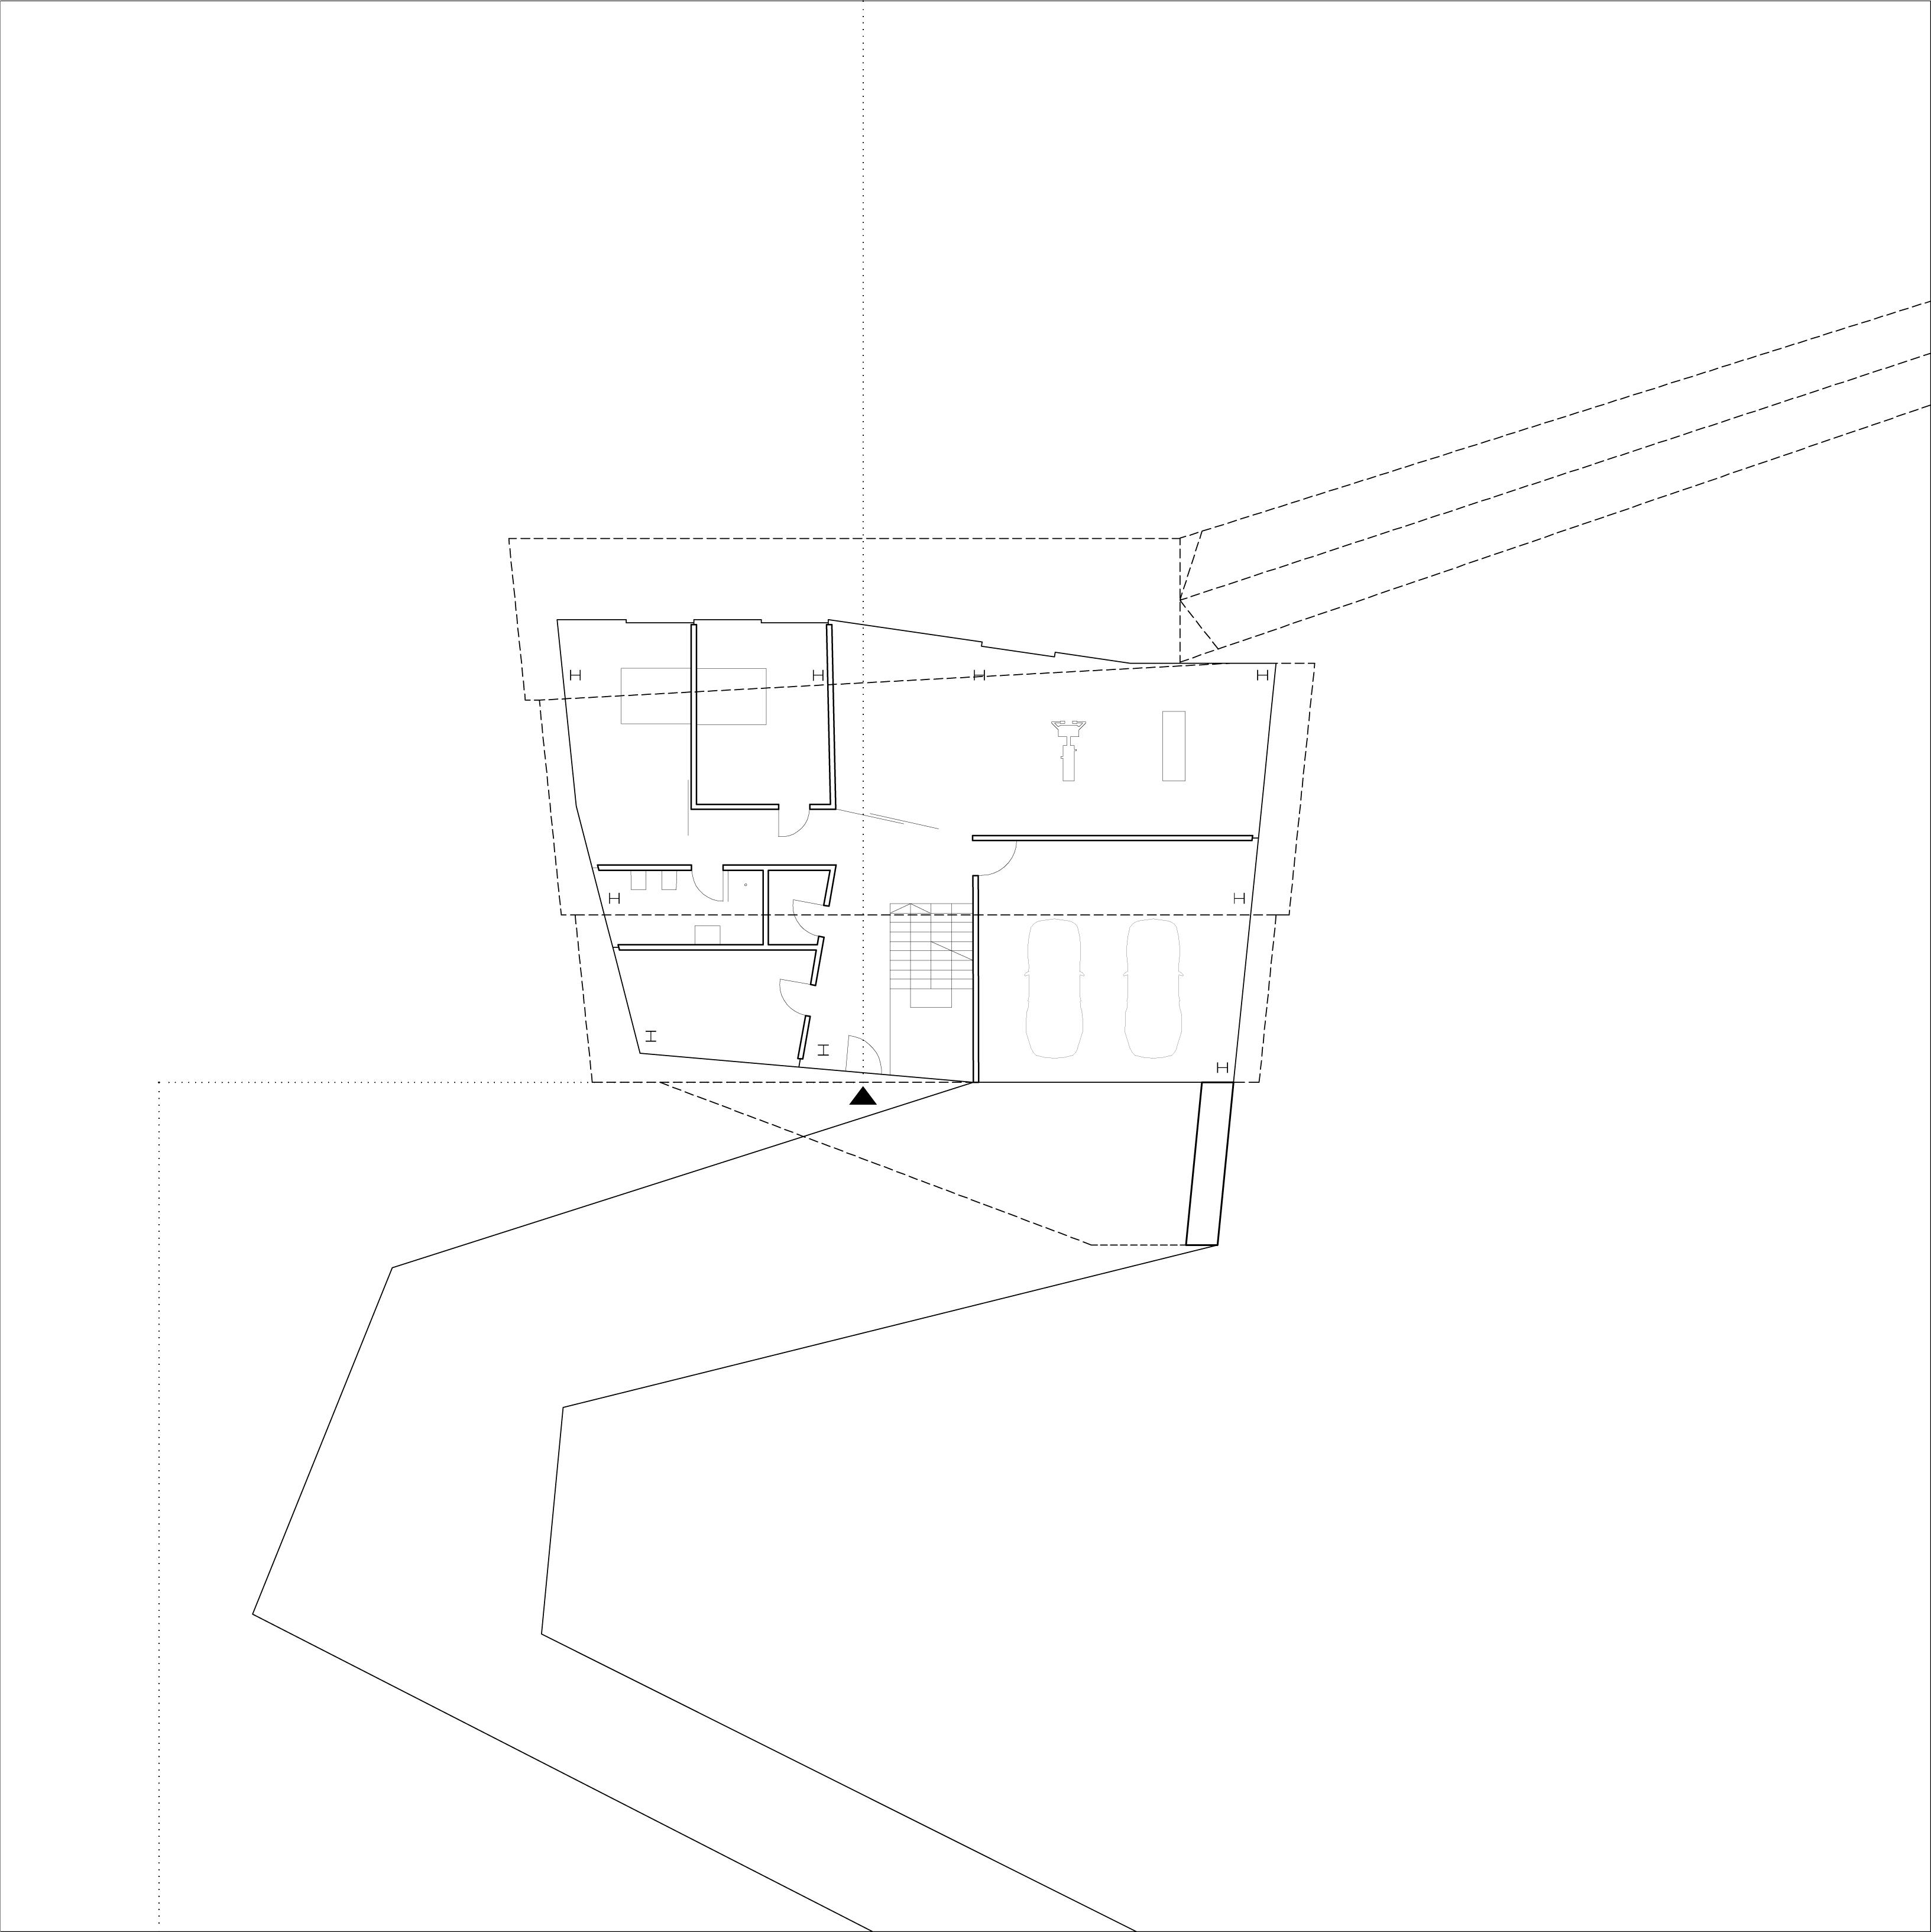 <p>Begane Grond, By The Way House, Polen – Robert Konieczny – KWK Promes team</p>